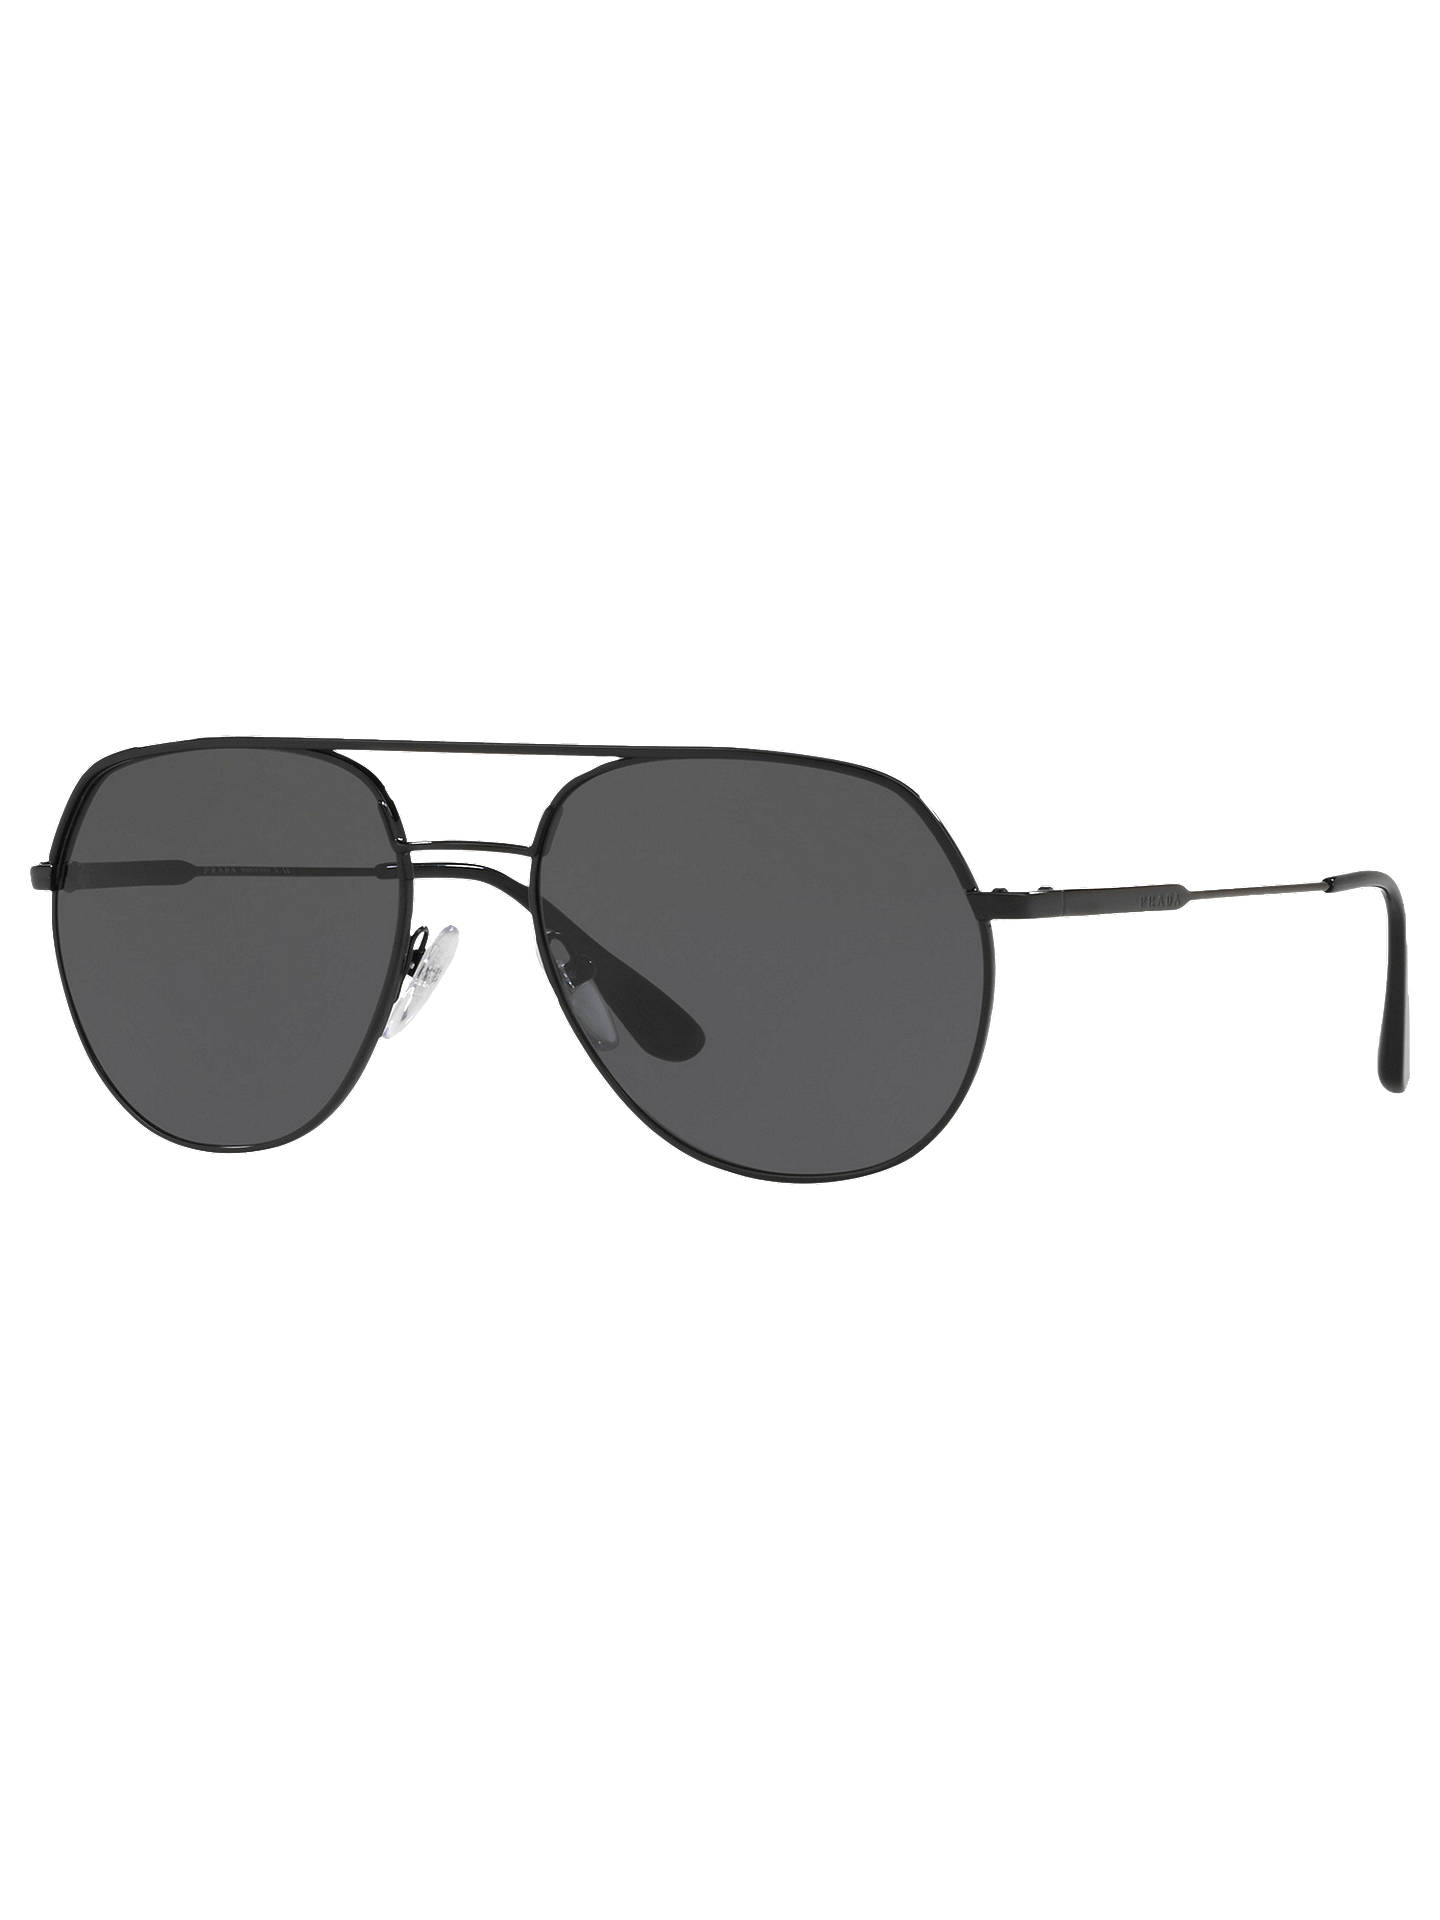 e5530525e0559 Prada 55US 57 Men s Polarised Aviator Sunglasses at John Lewis ...